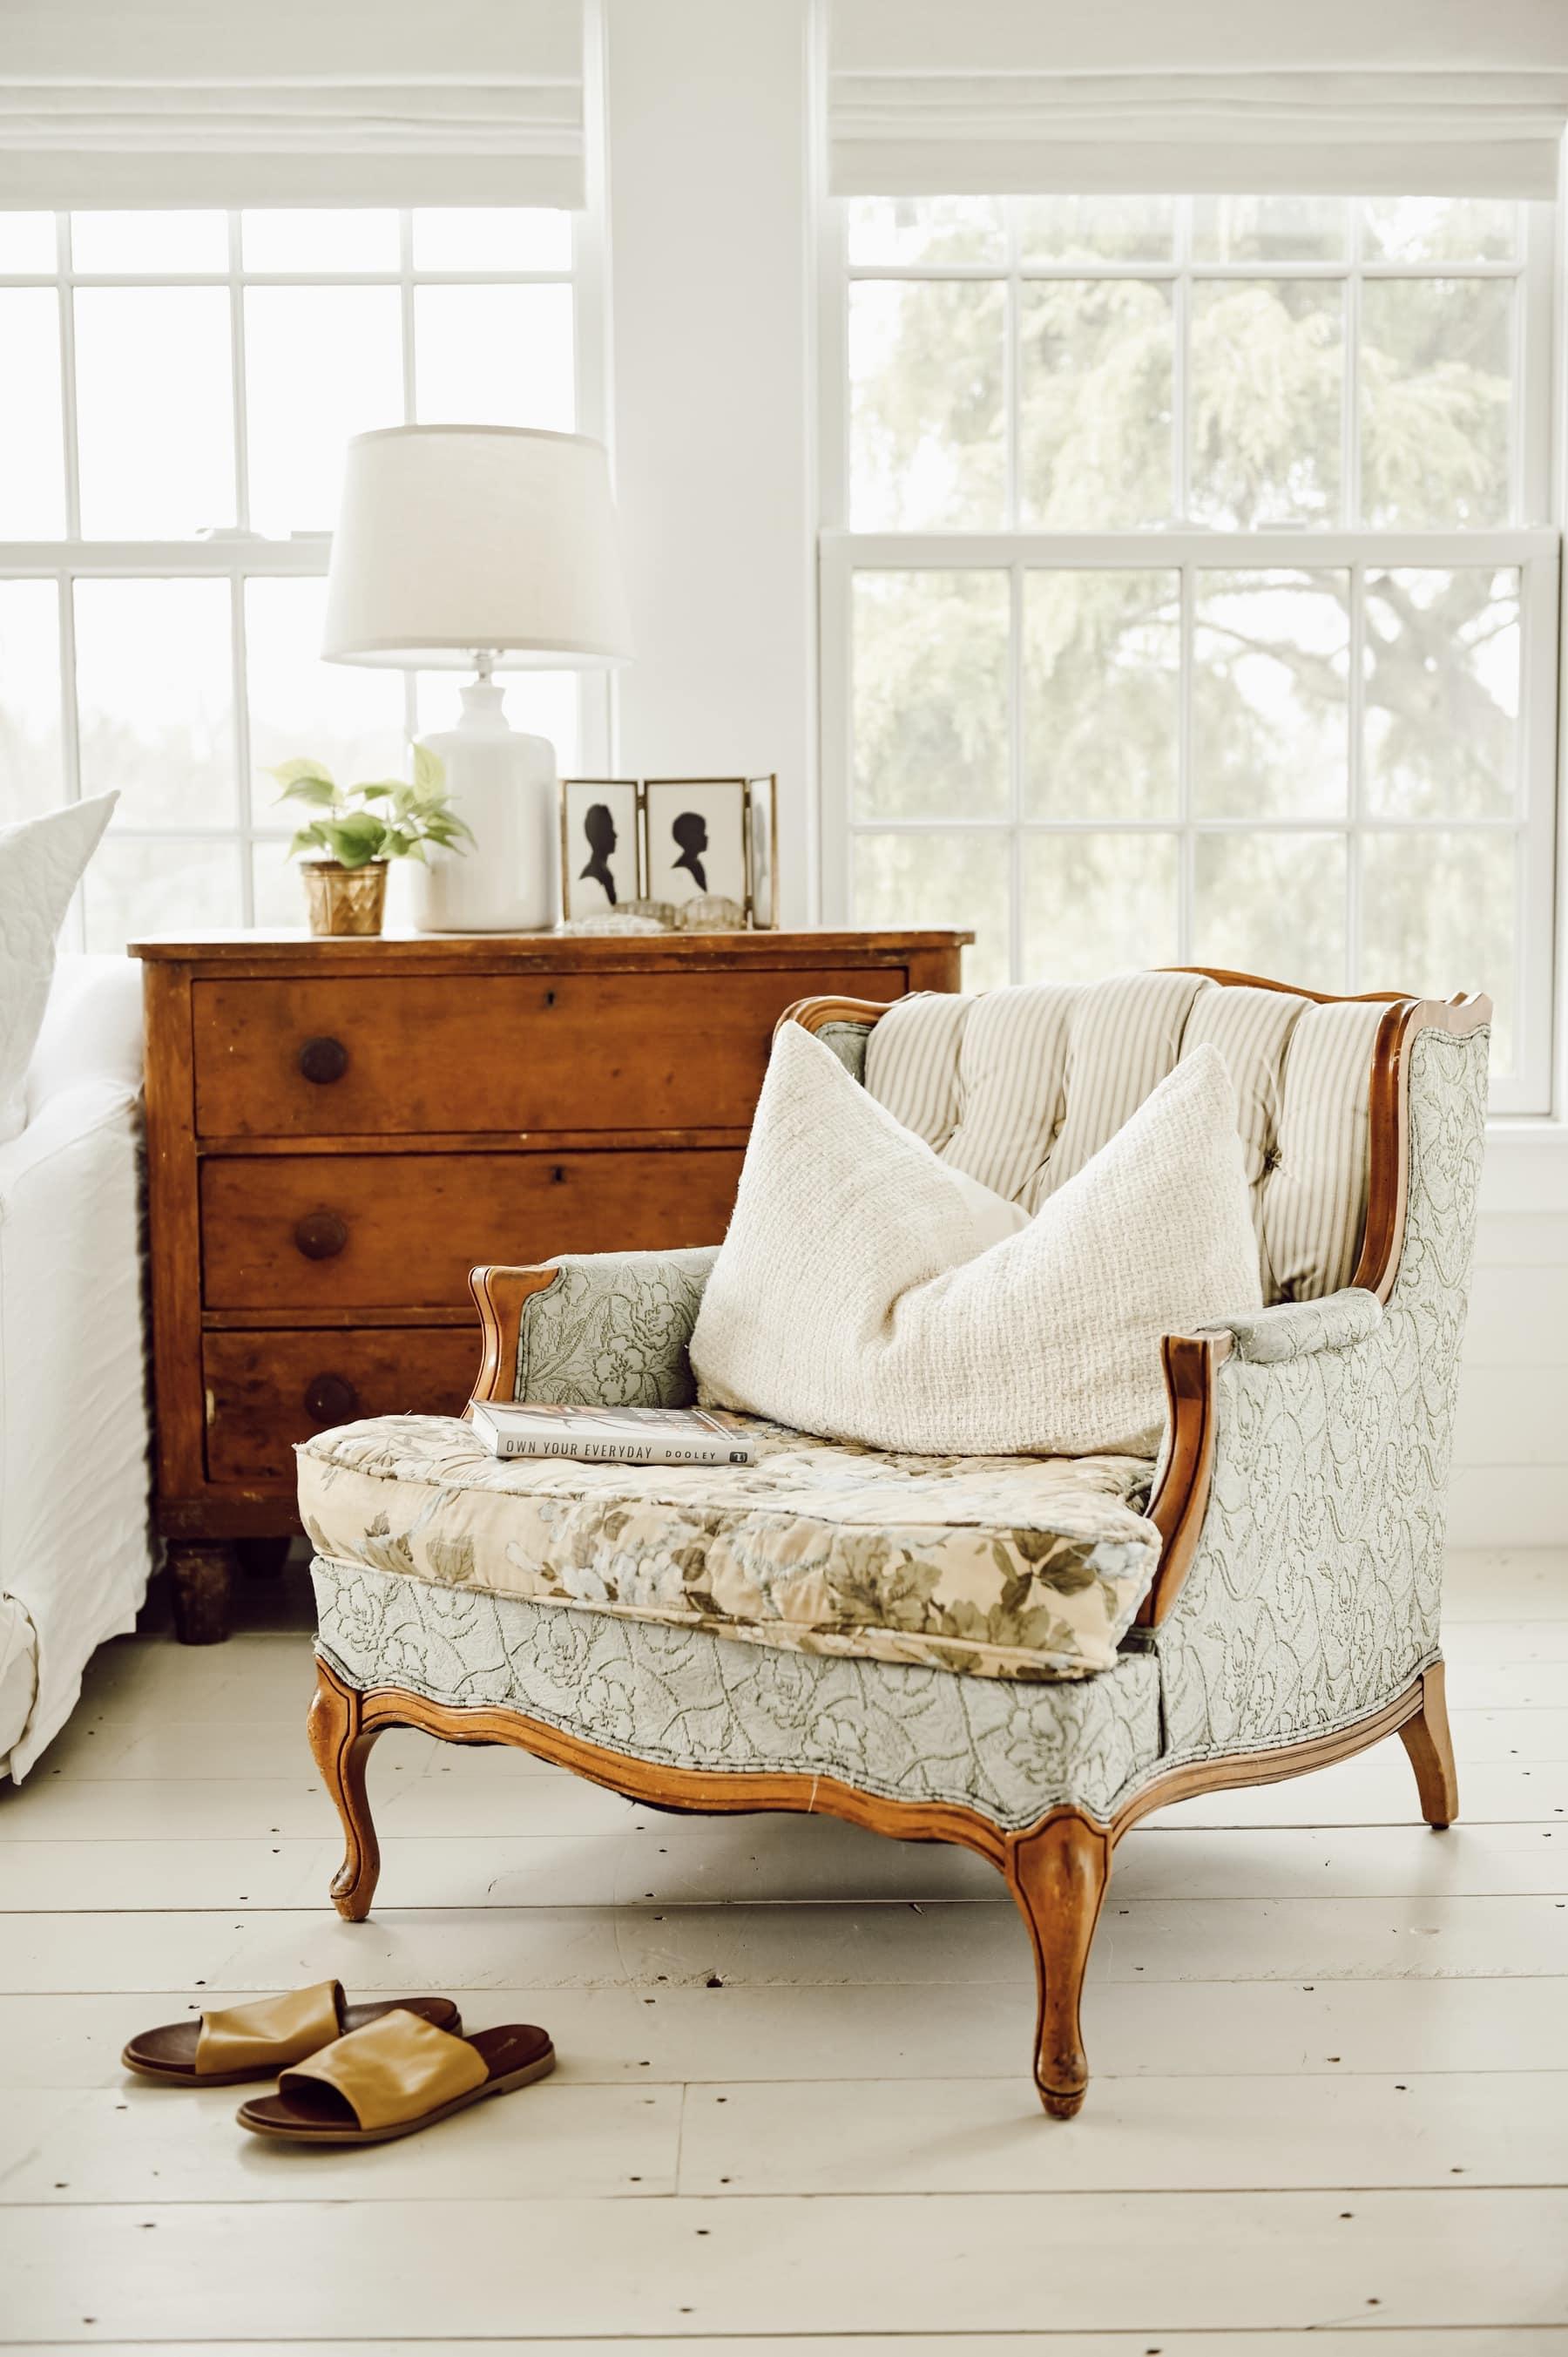 A New Cozy Vintage Chair - Liz Marie Blog